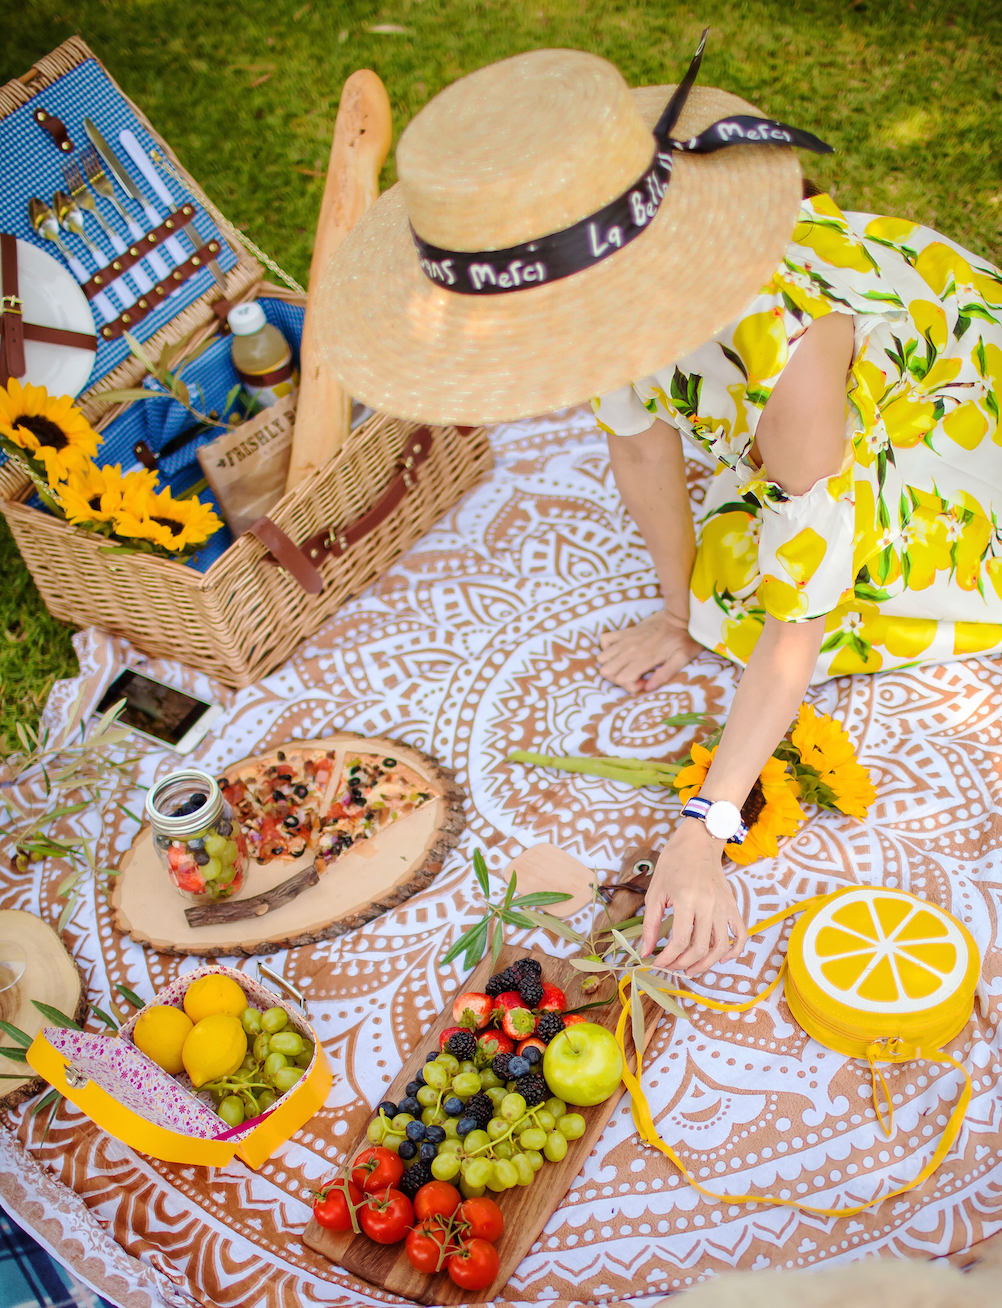 elegant-picnic-basket